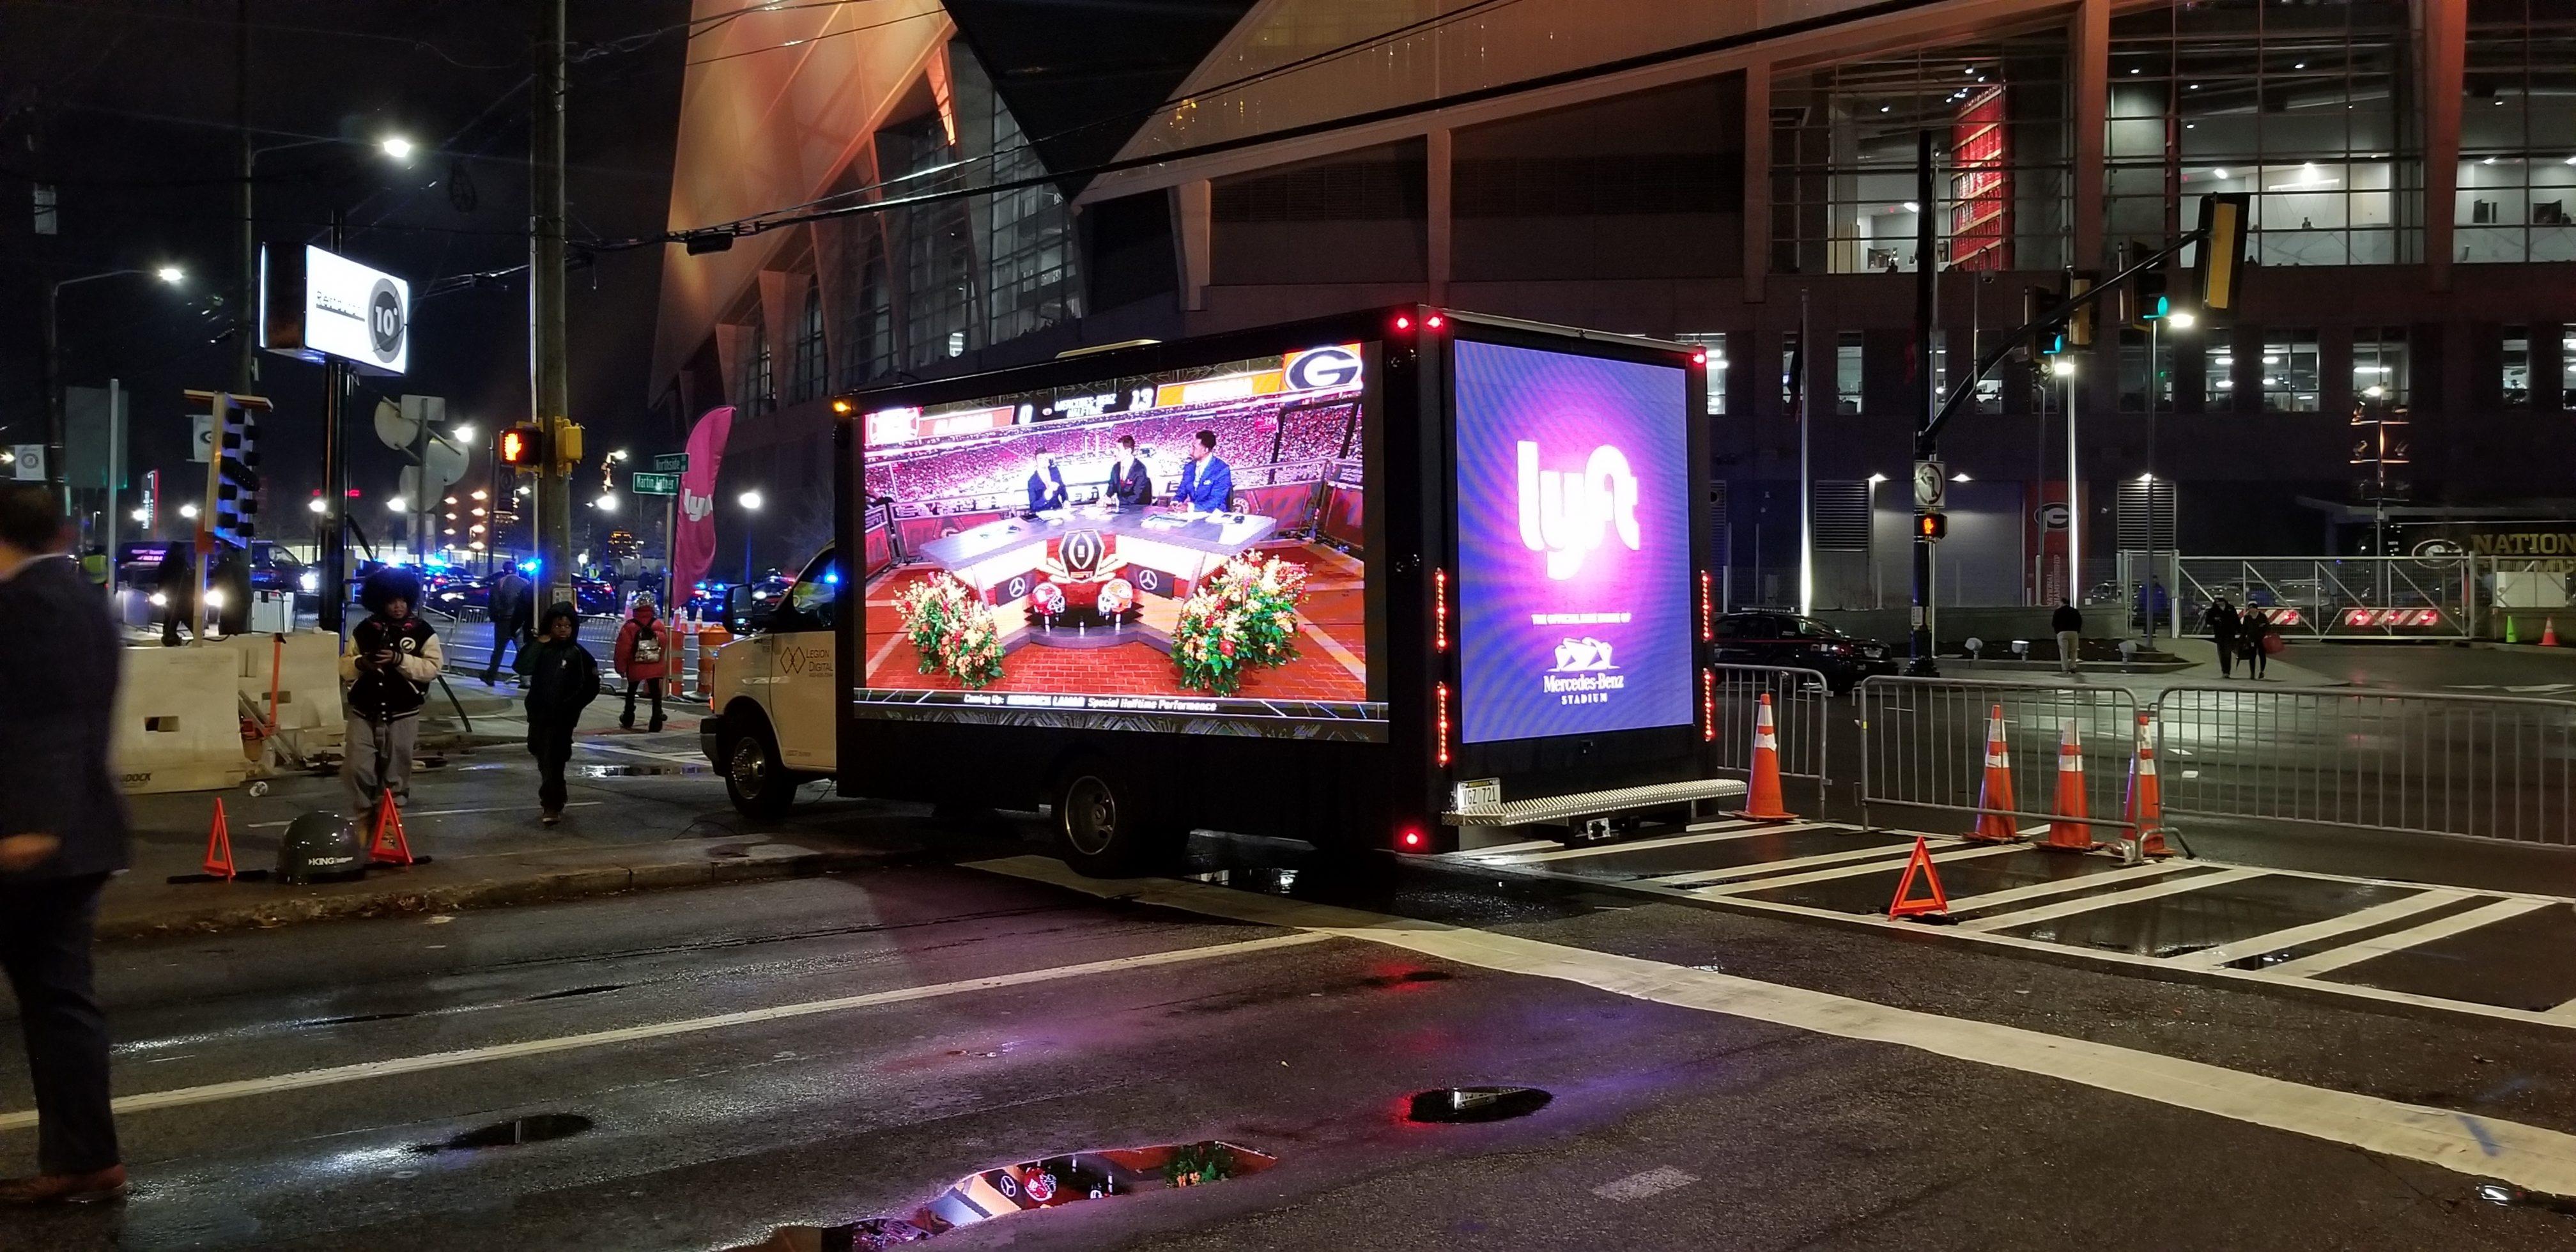 2017 Gmc Savana P6 Led Billboard Truck